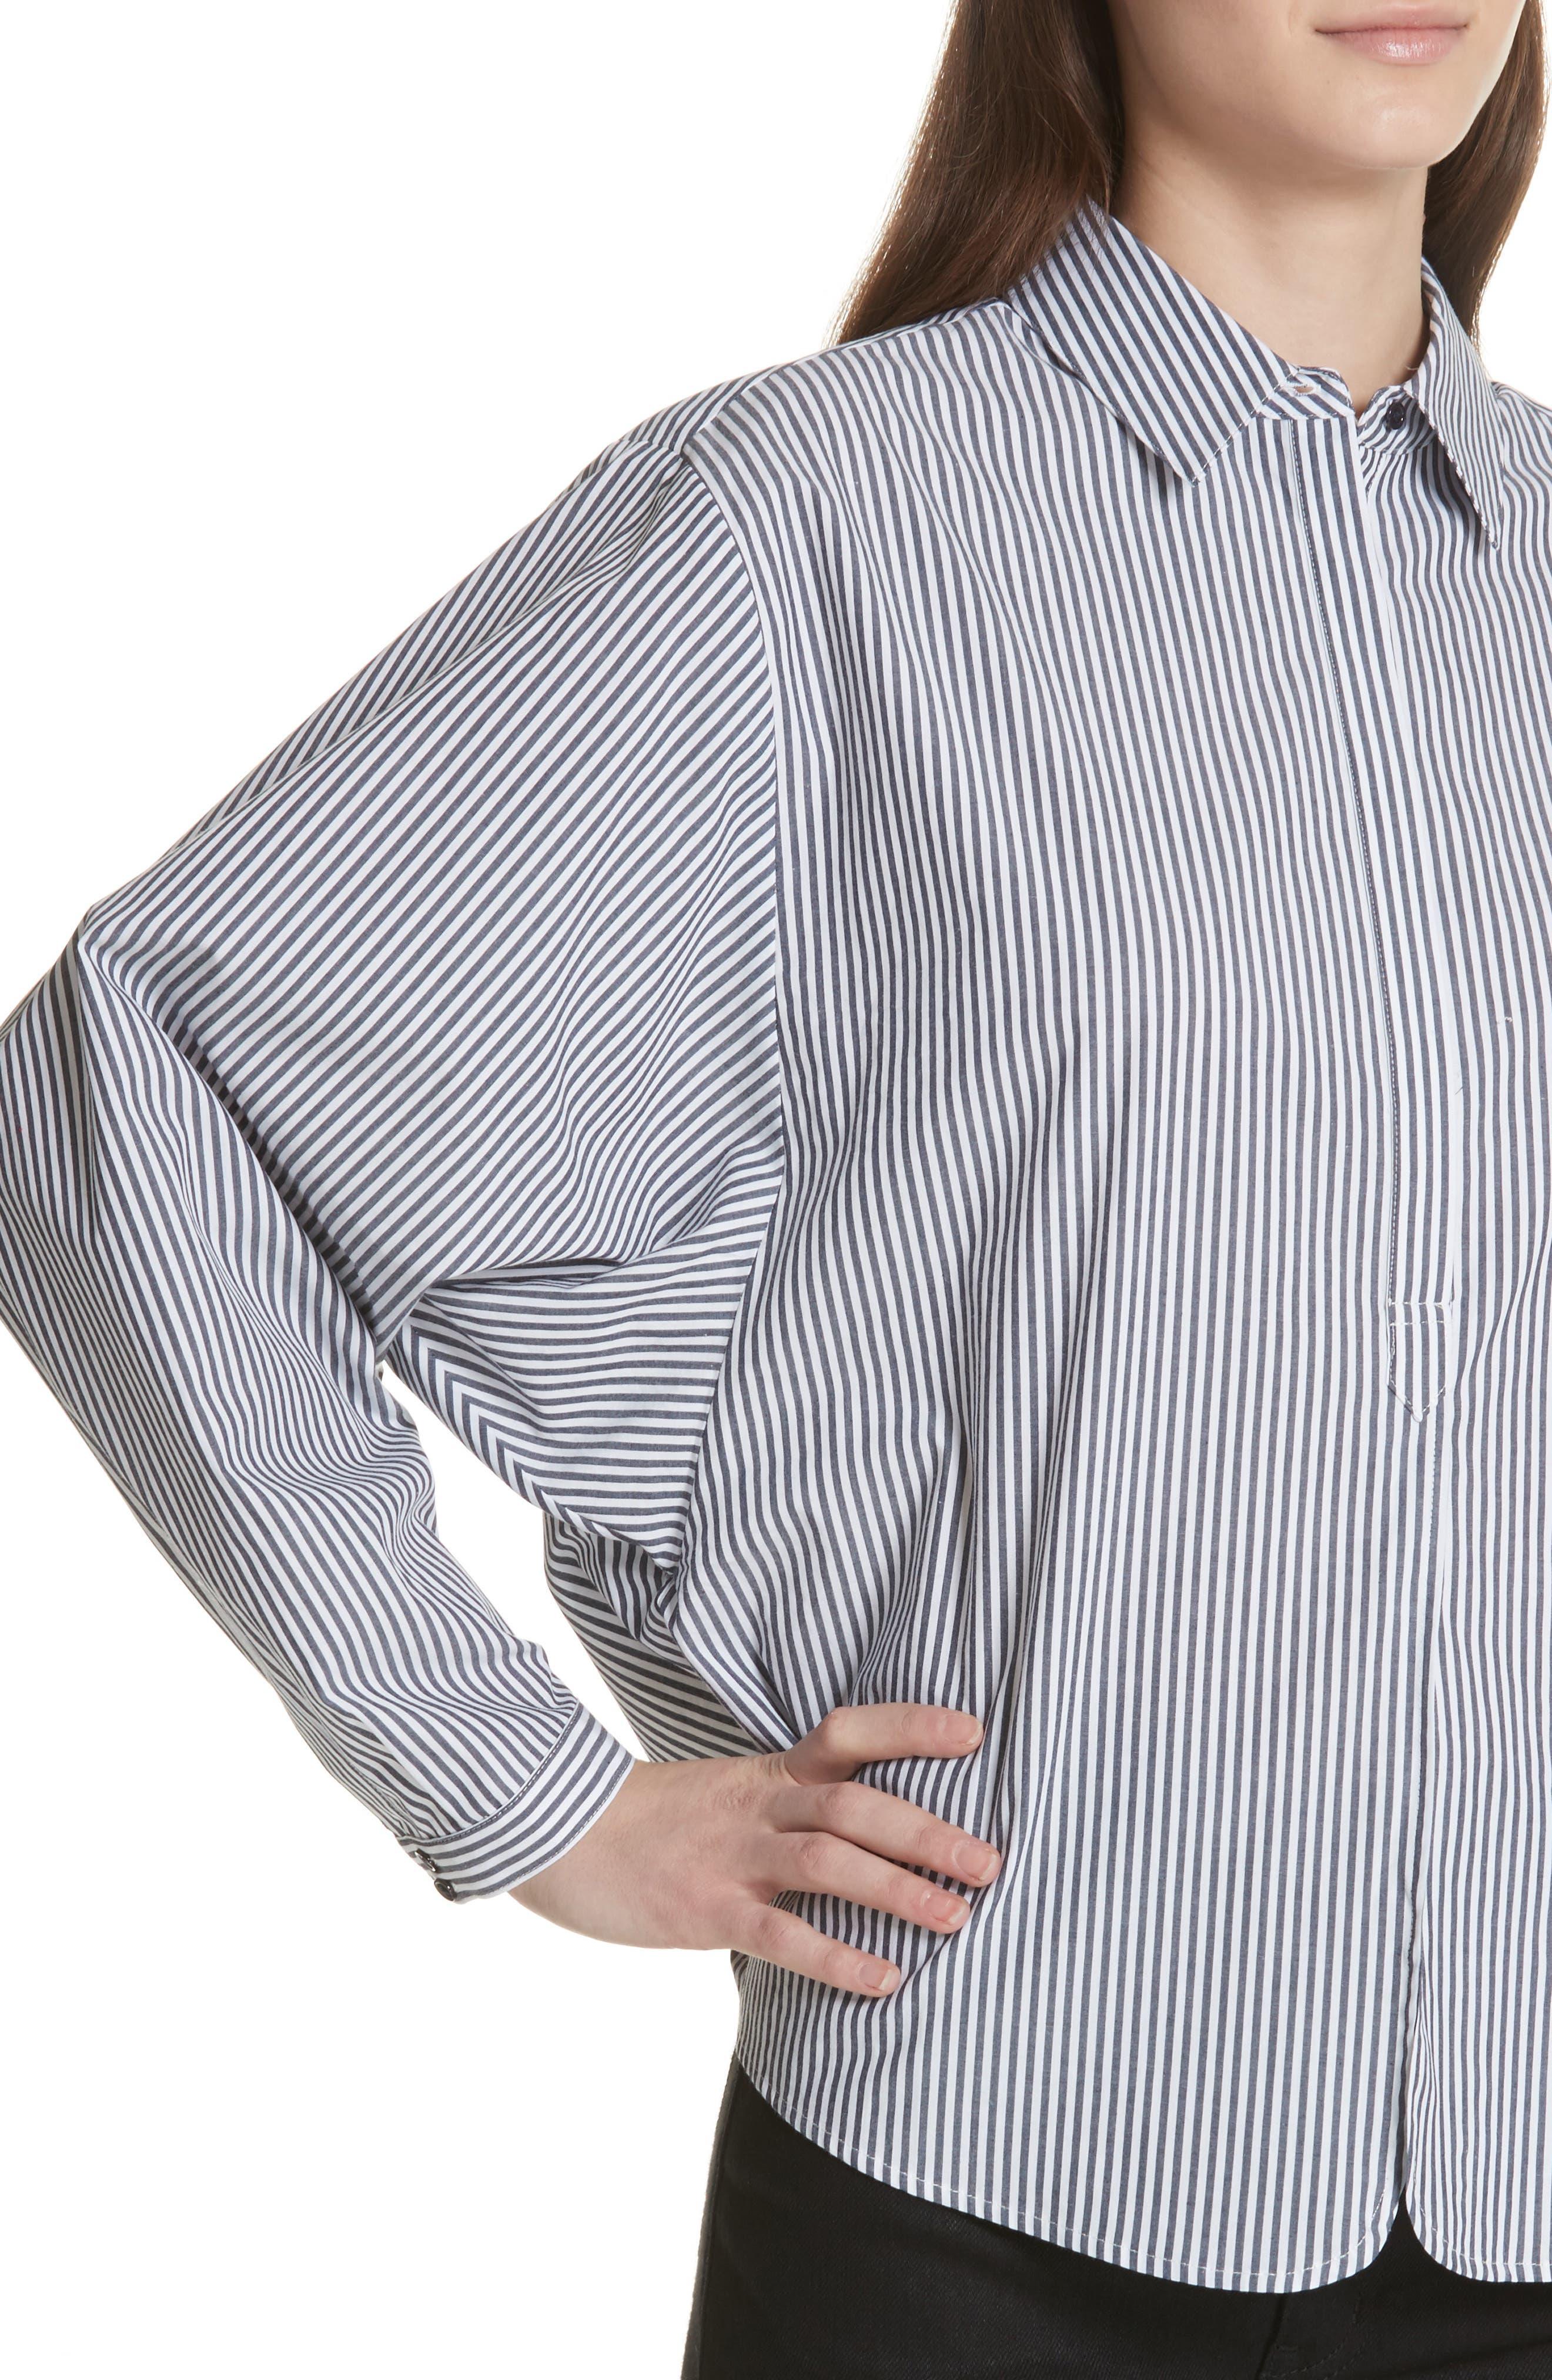 Anjanique Spread Collar Top,                             Alternate thumbnail 4, color,                             418